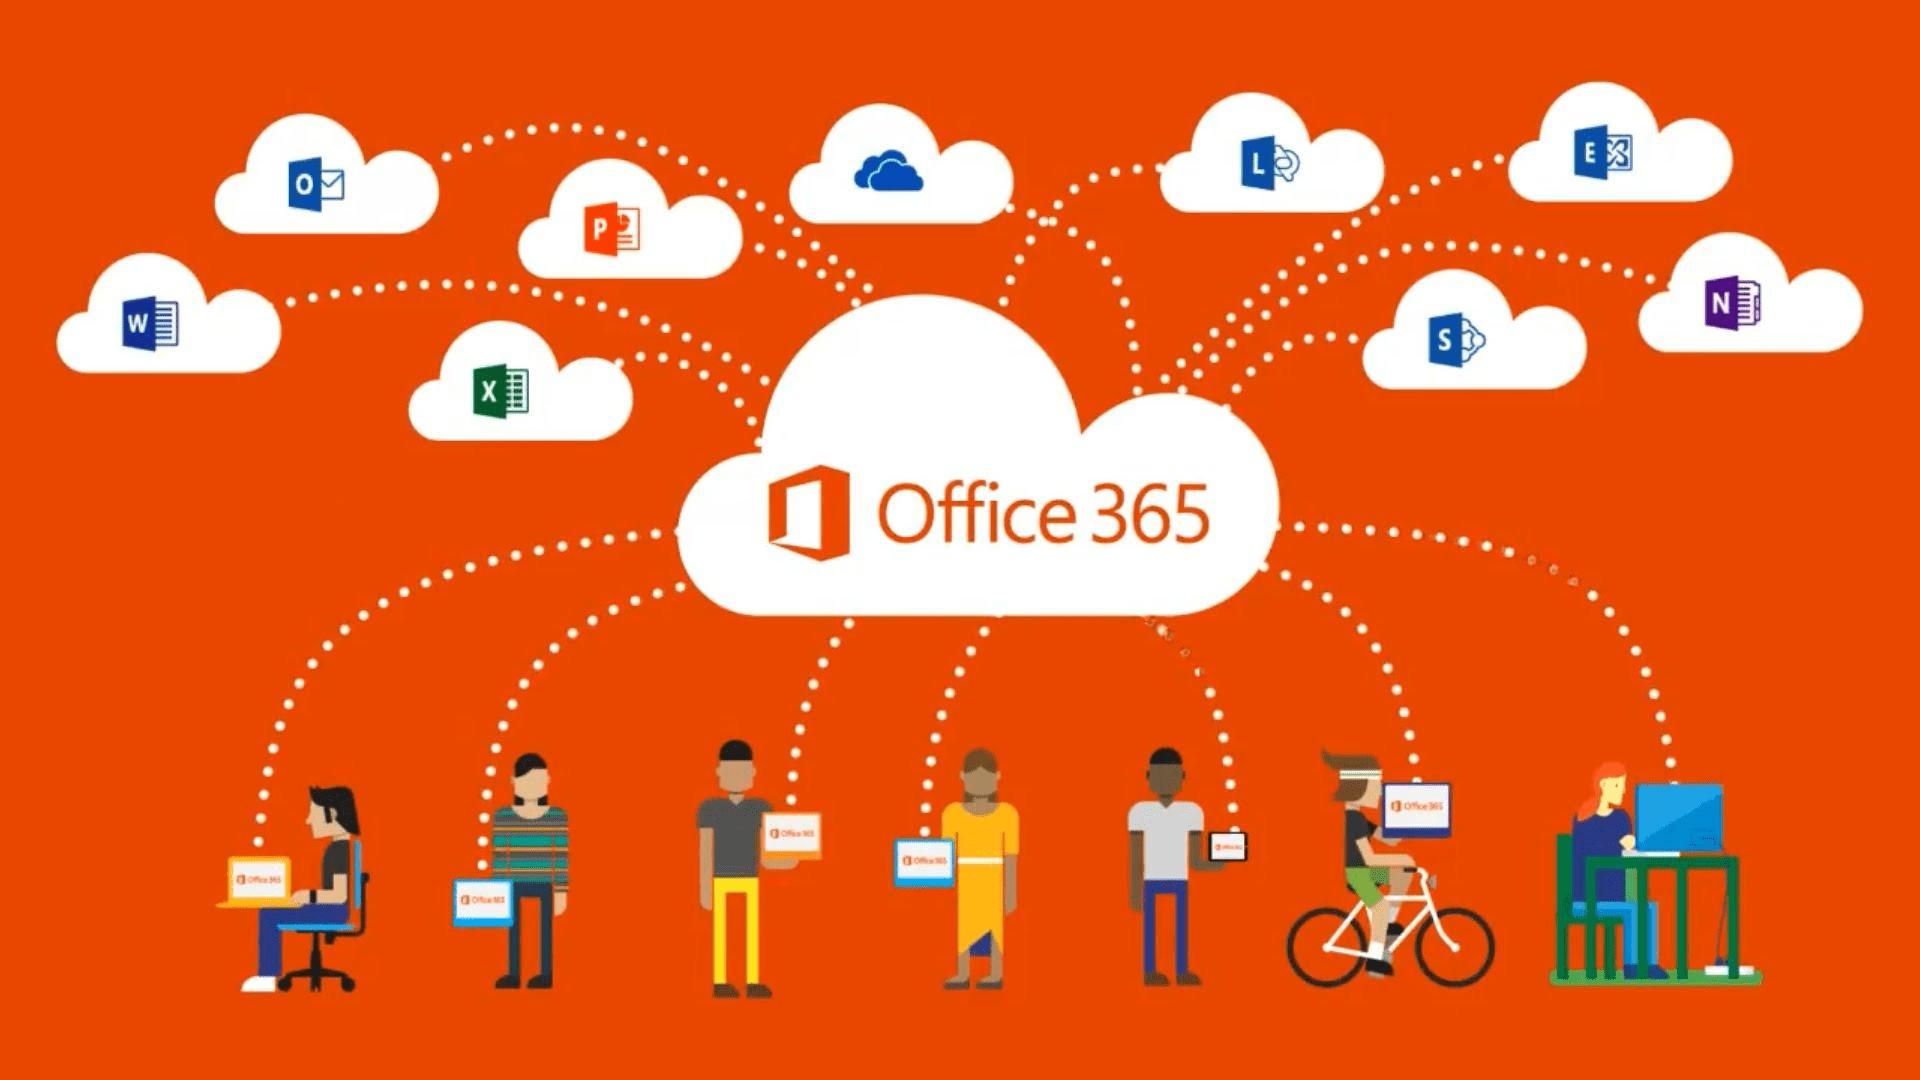 Microsoft office 365 clipart 5 » Clipart Portal.